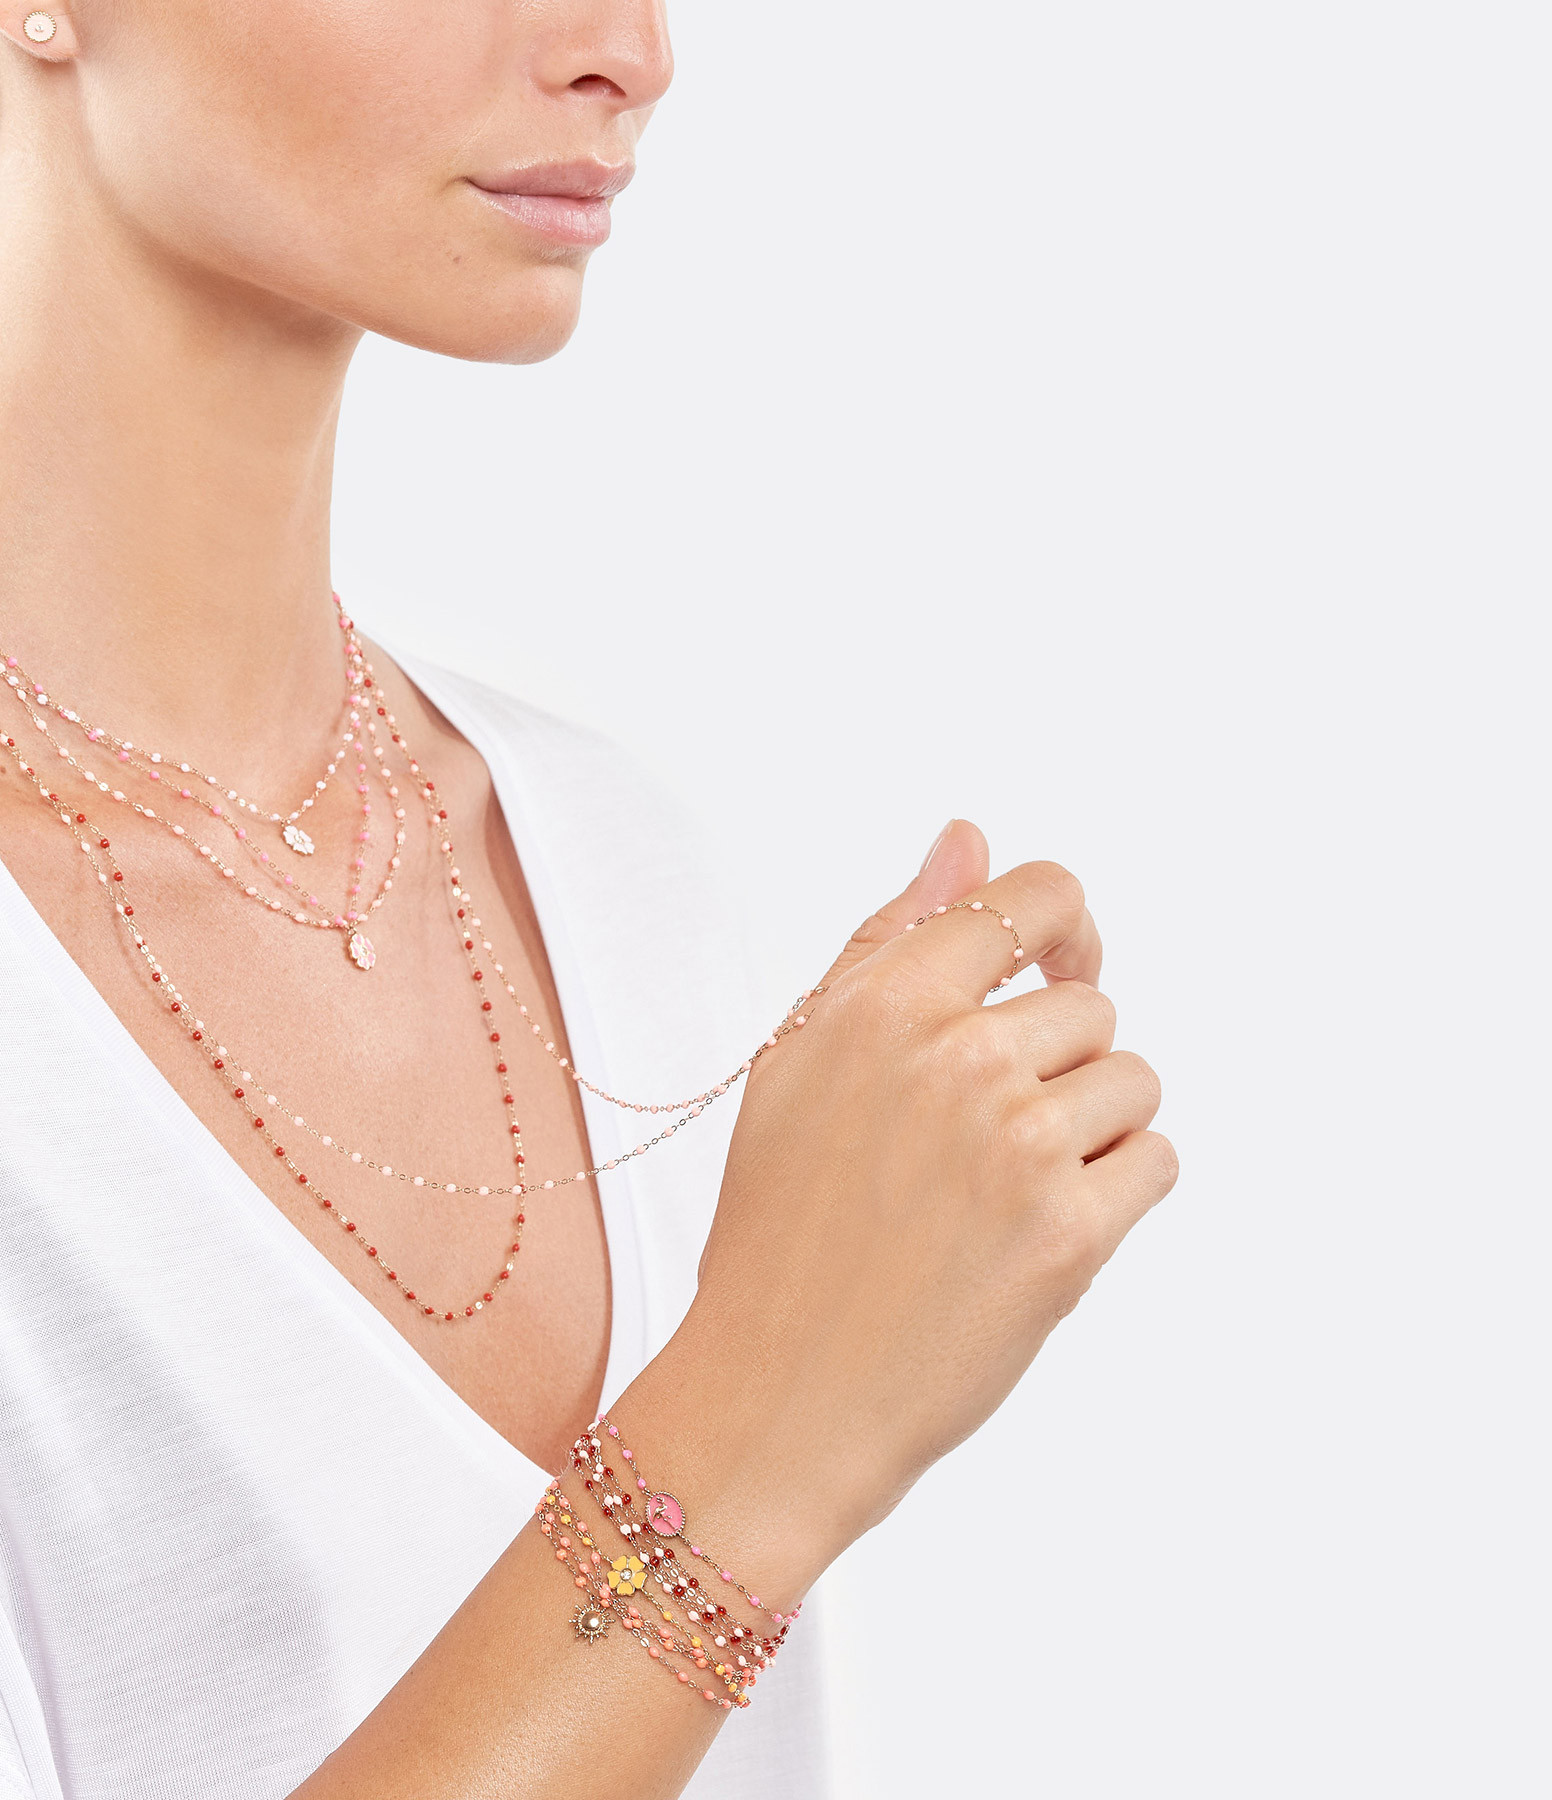 GIGI CLOZEAU - Bracelet Flamant Rose Perles Résine OG Rose Fluo